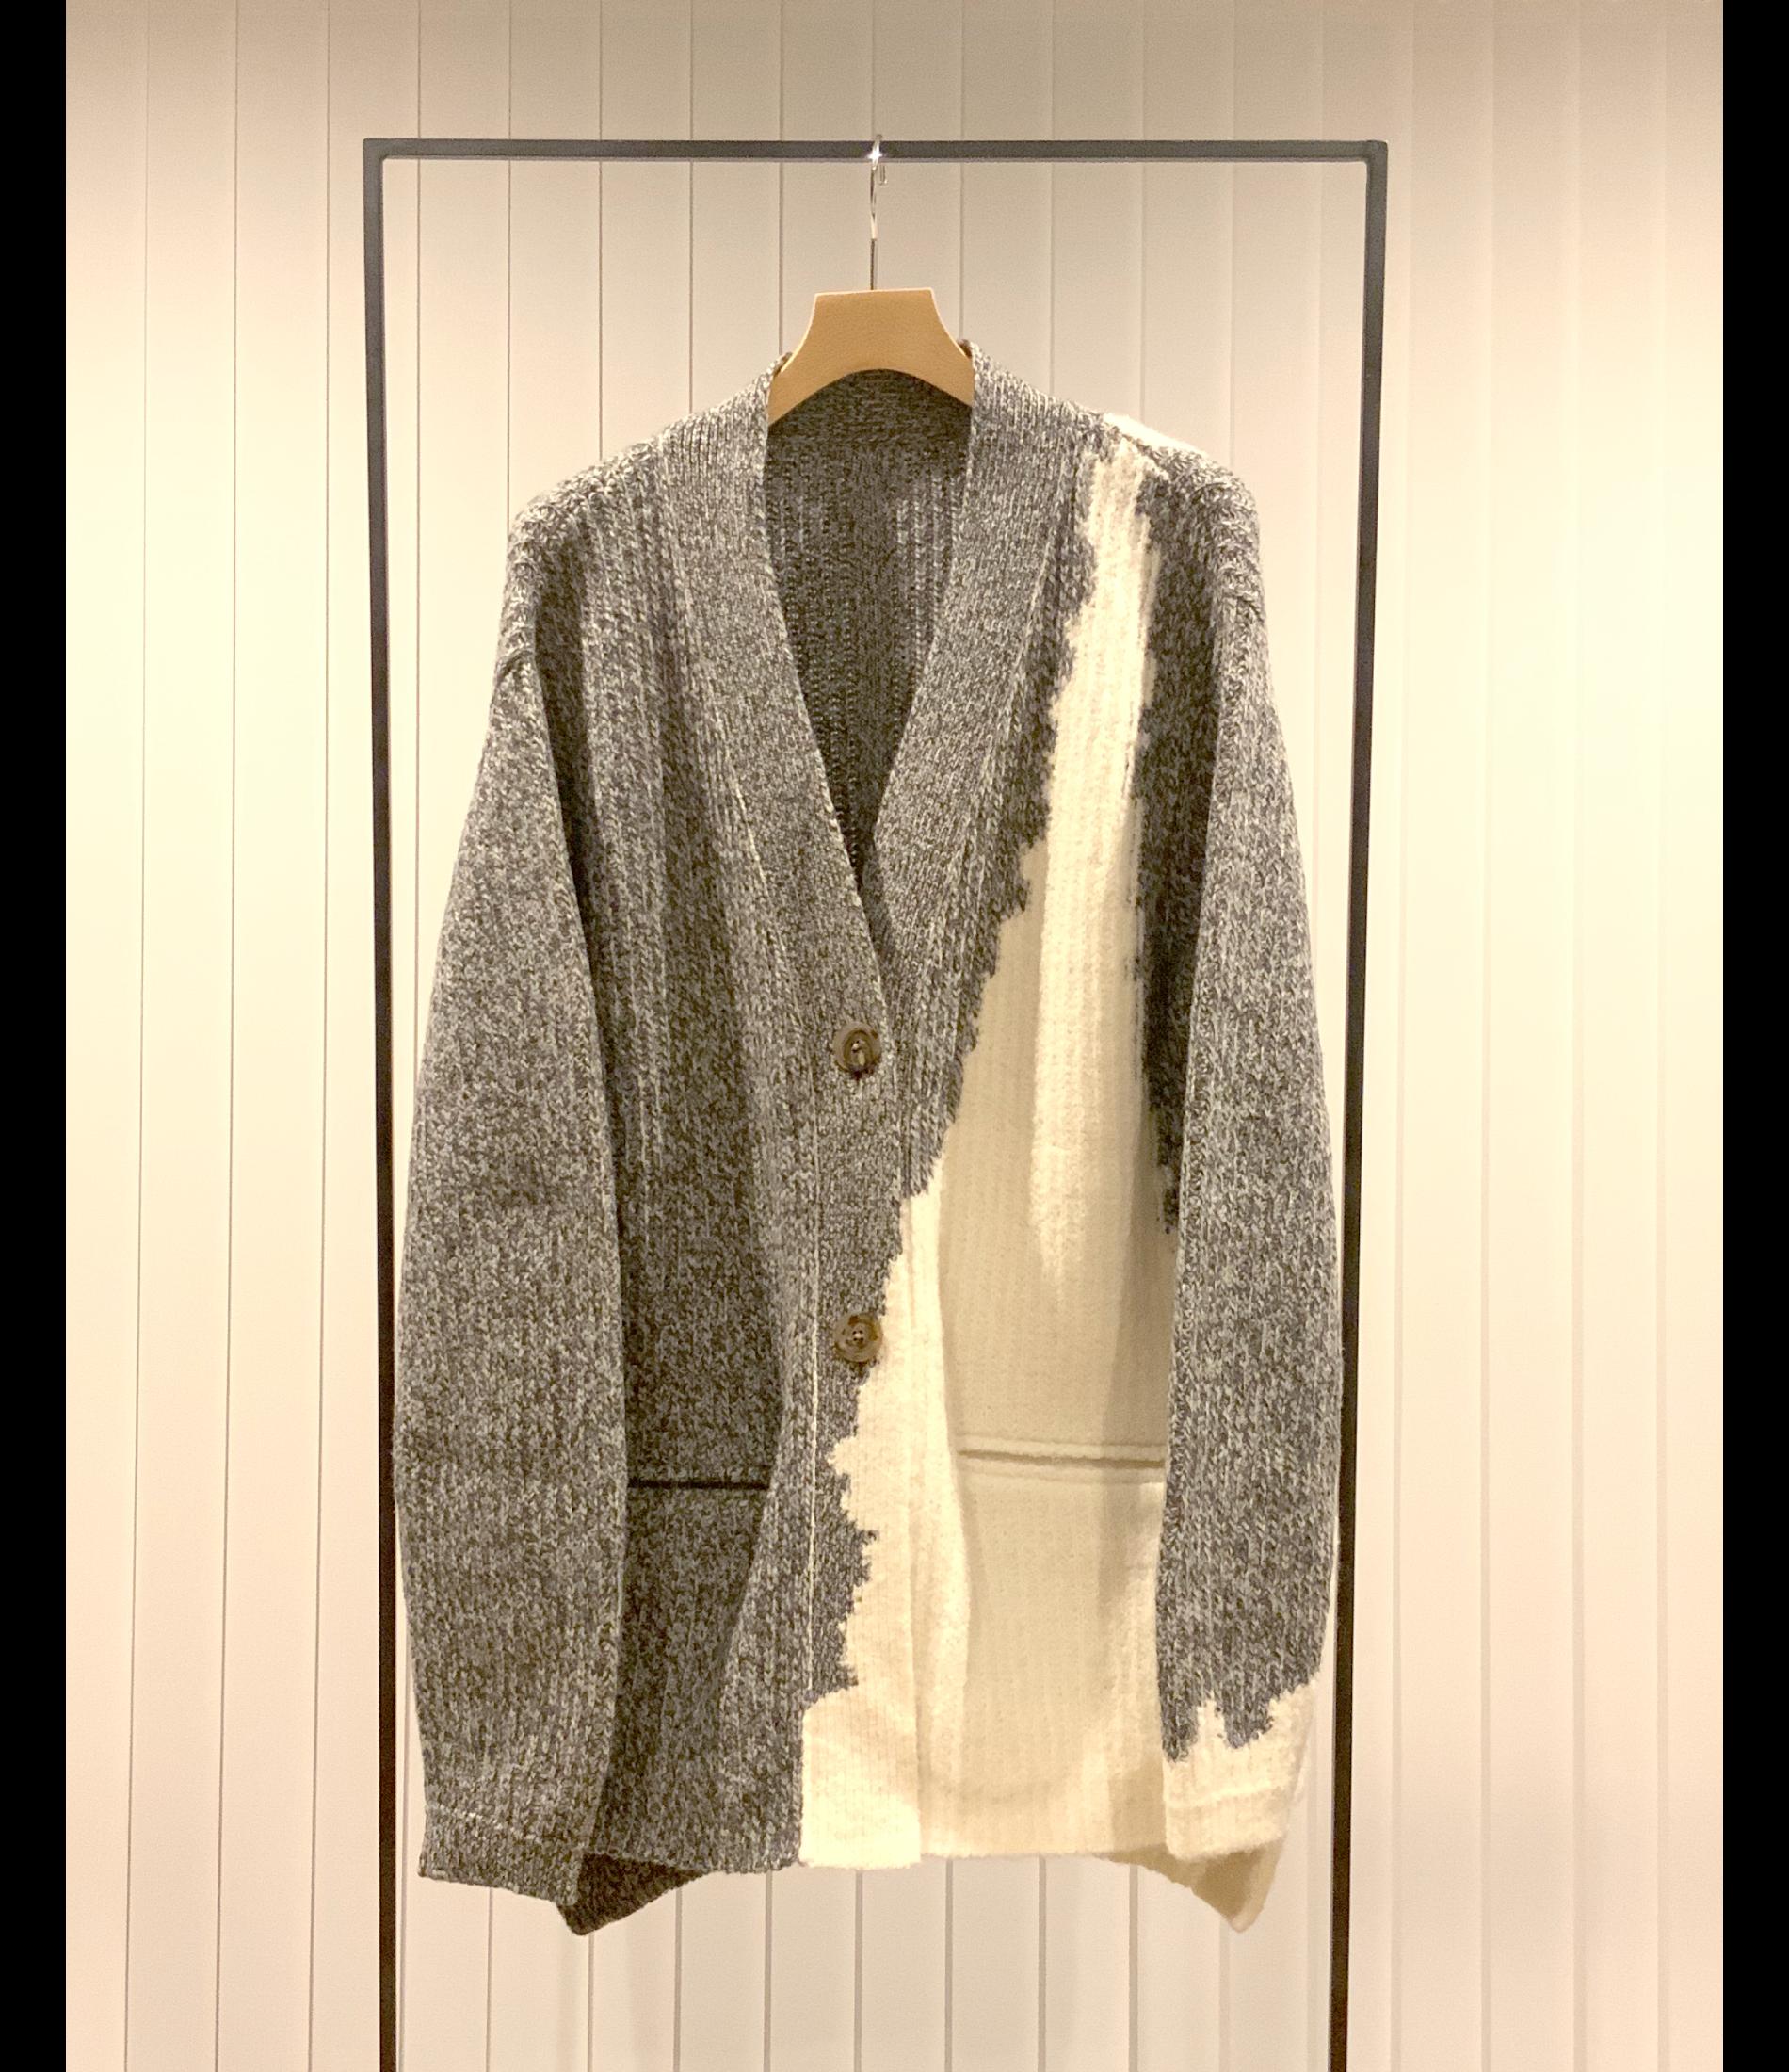 Intersia Cardigan / Off White